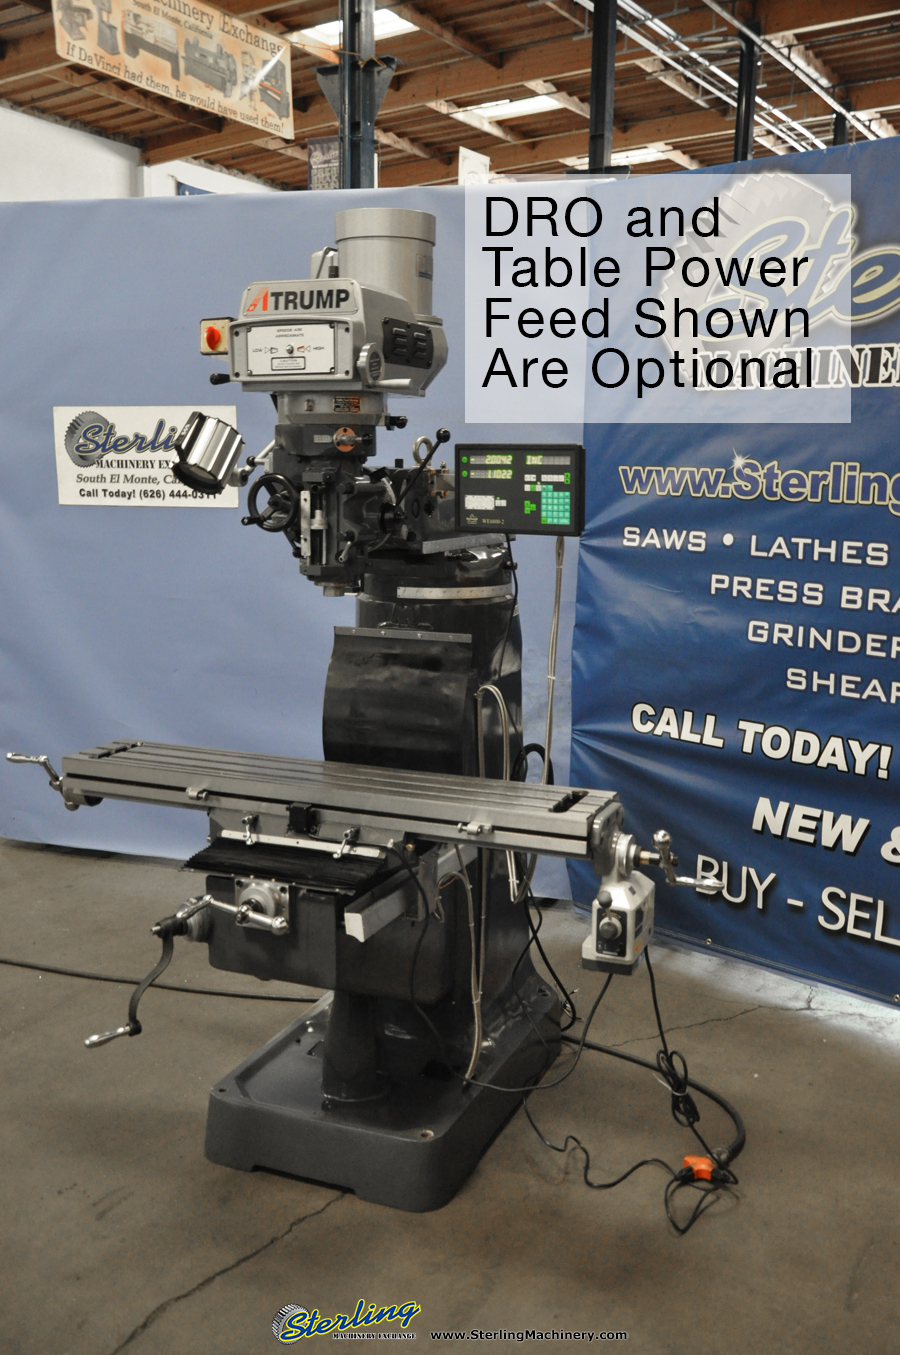 Brand New Atrump Variable Speed Vertical Milling Machine